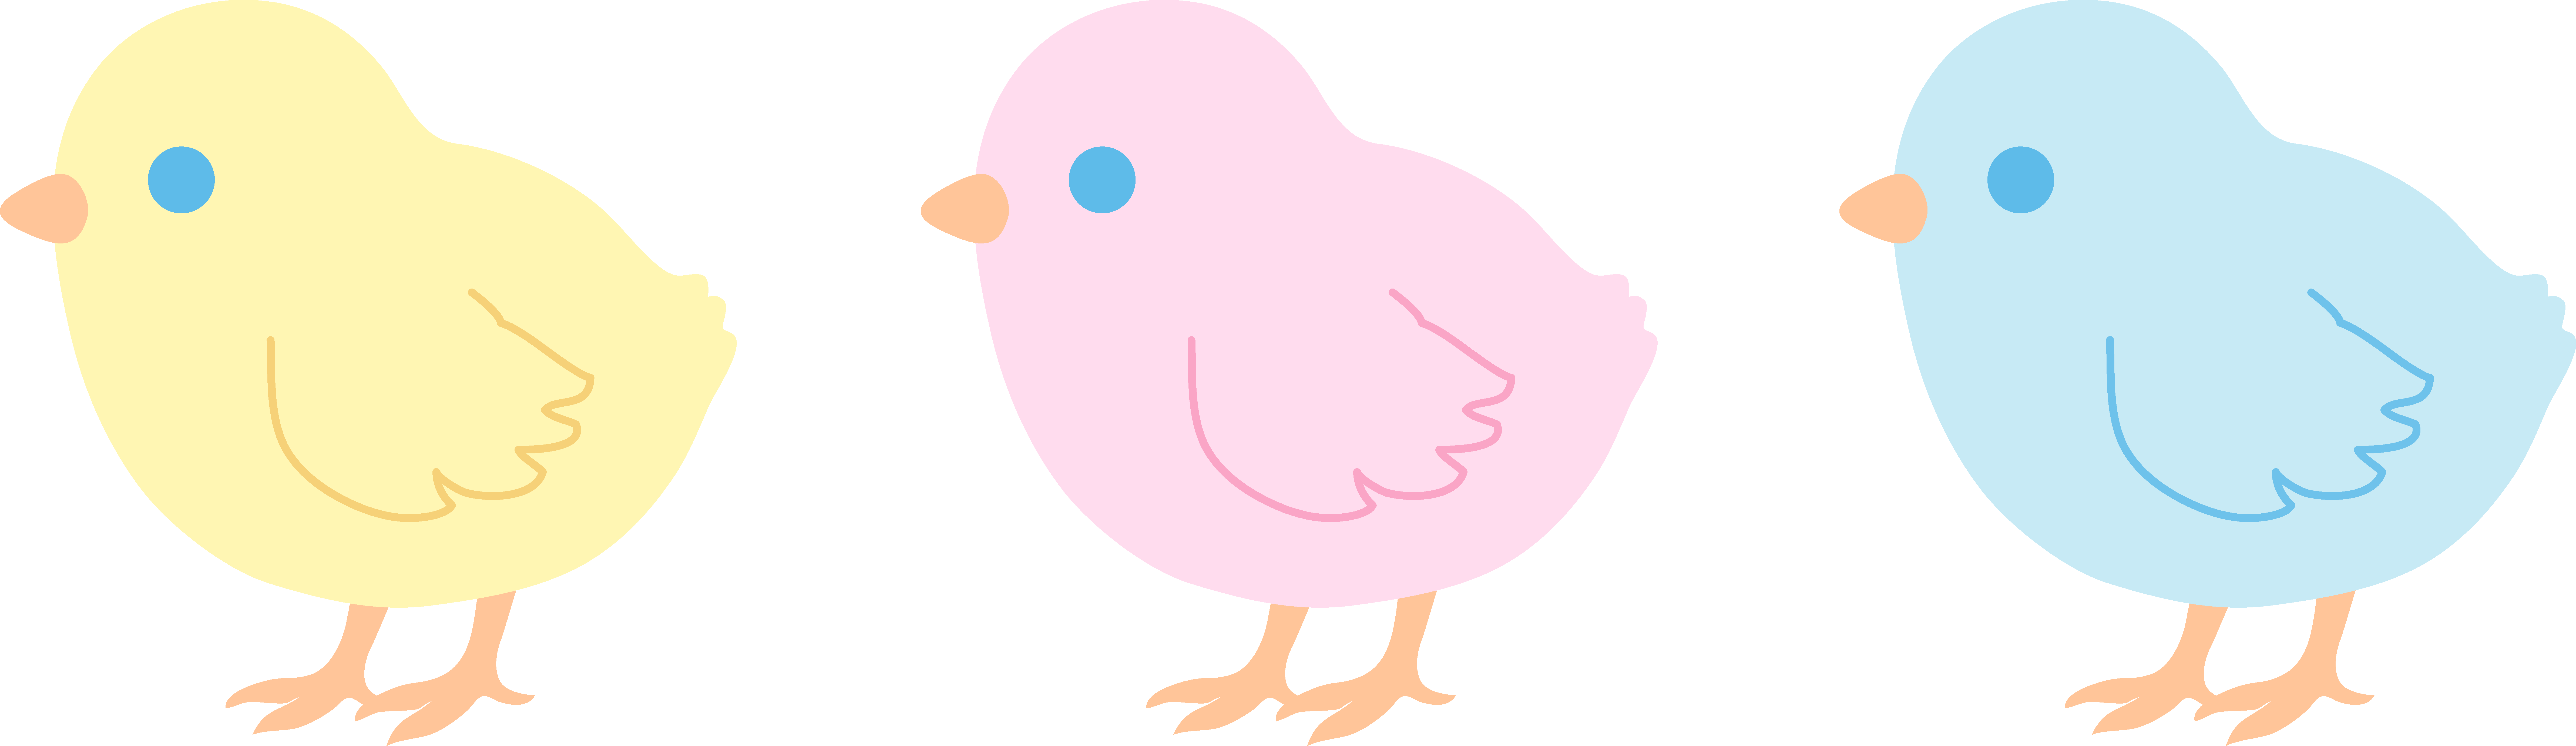 9537x2761 Three Cute Pastel Baby Chicks